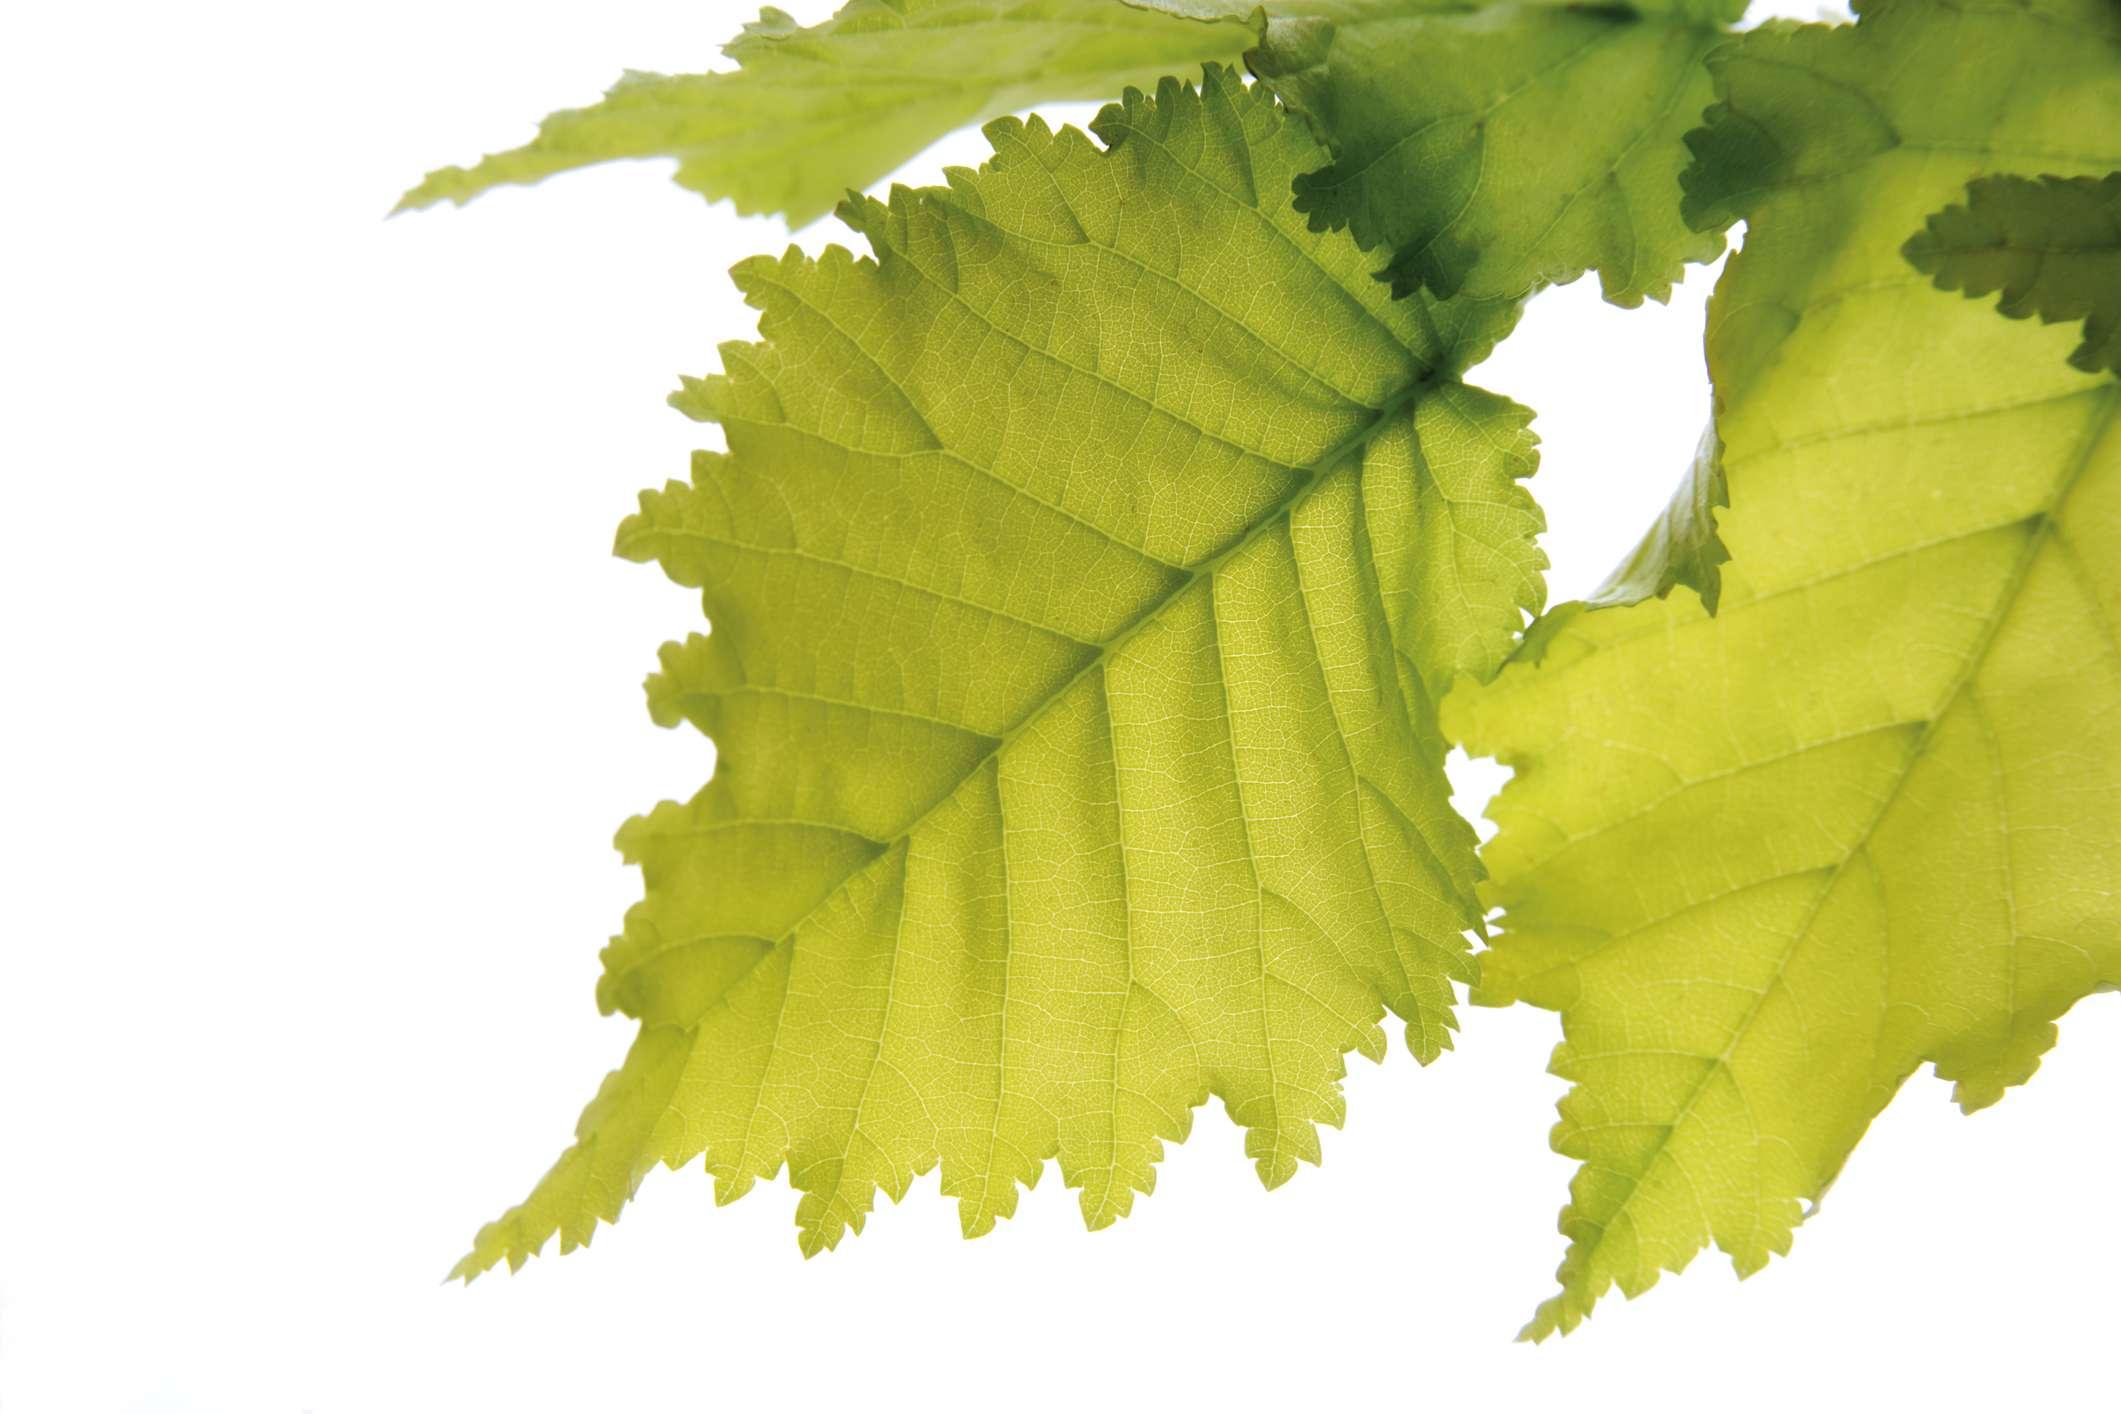 Elm leaves (Ulmus Americana) against white background, close-up